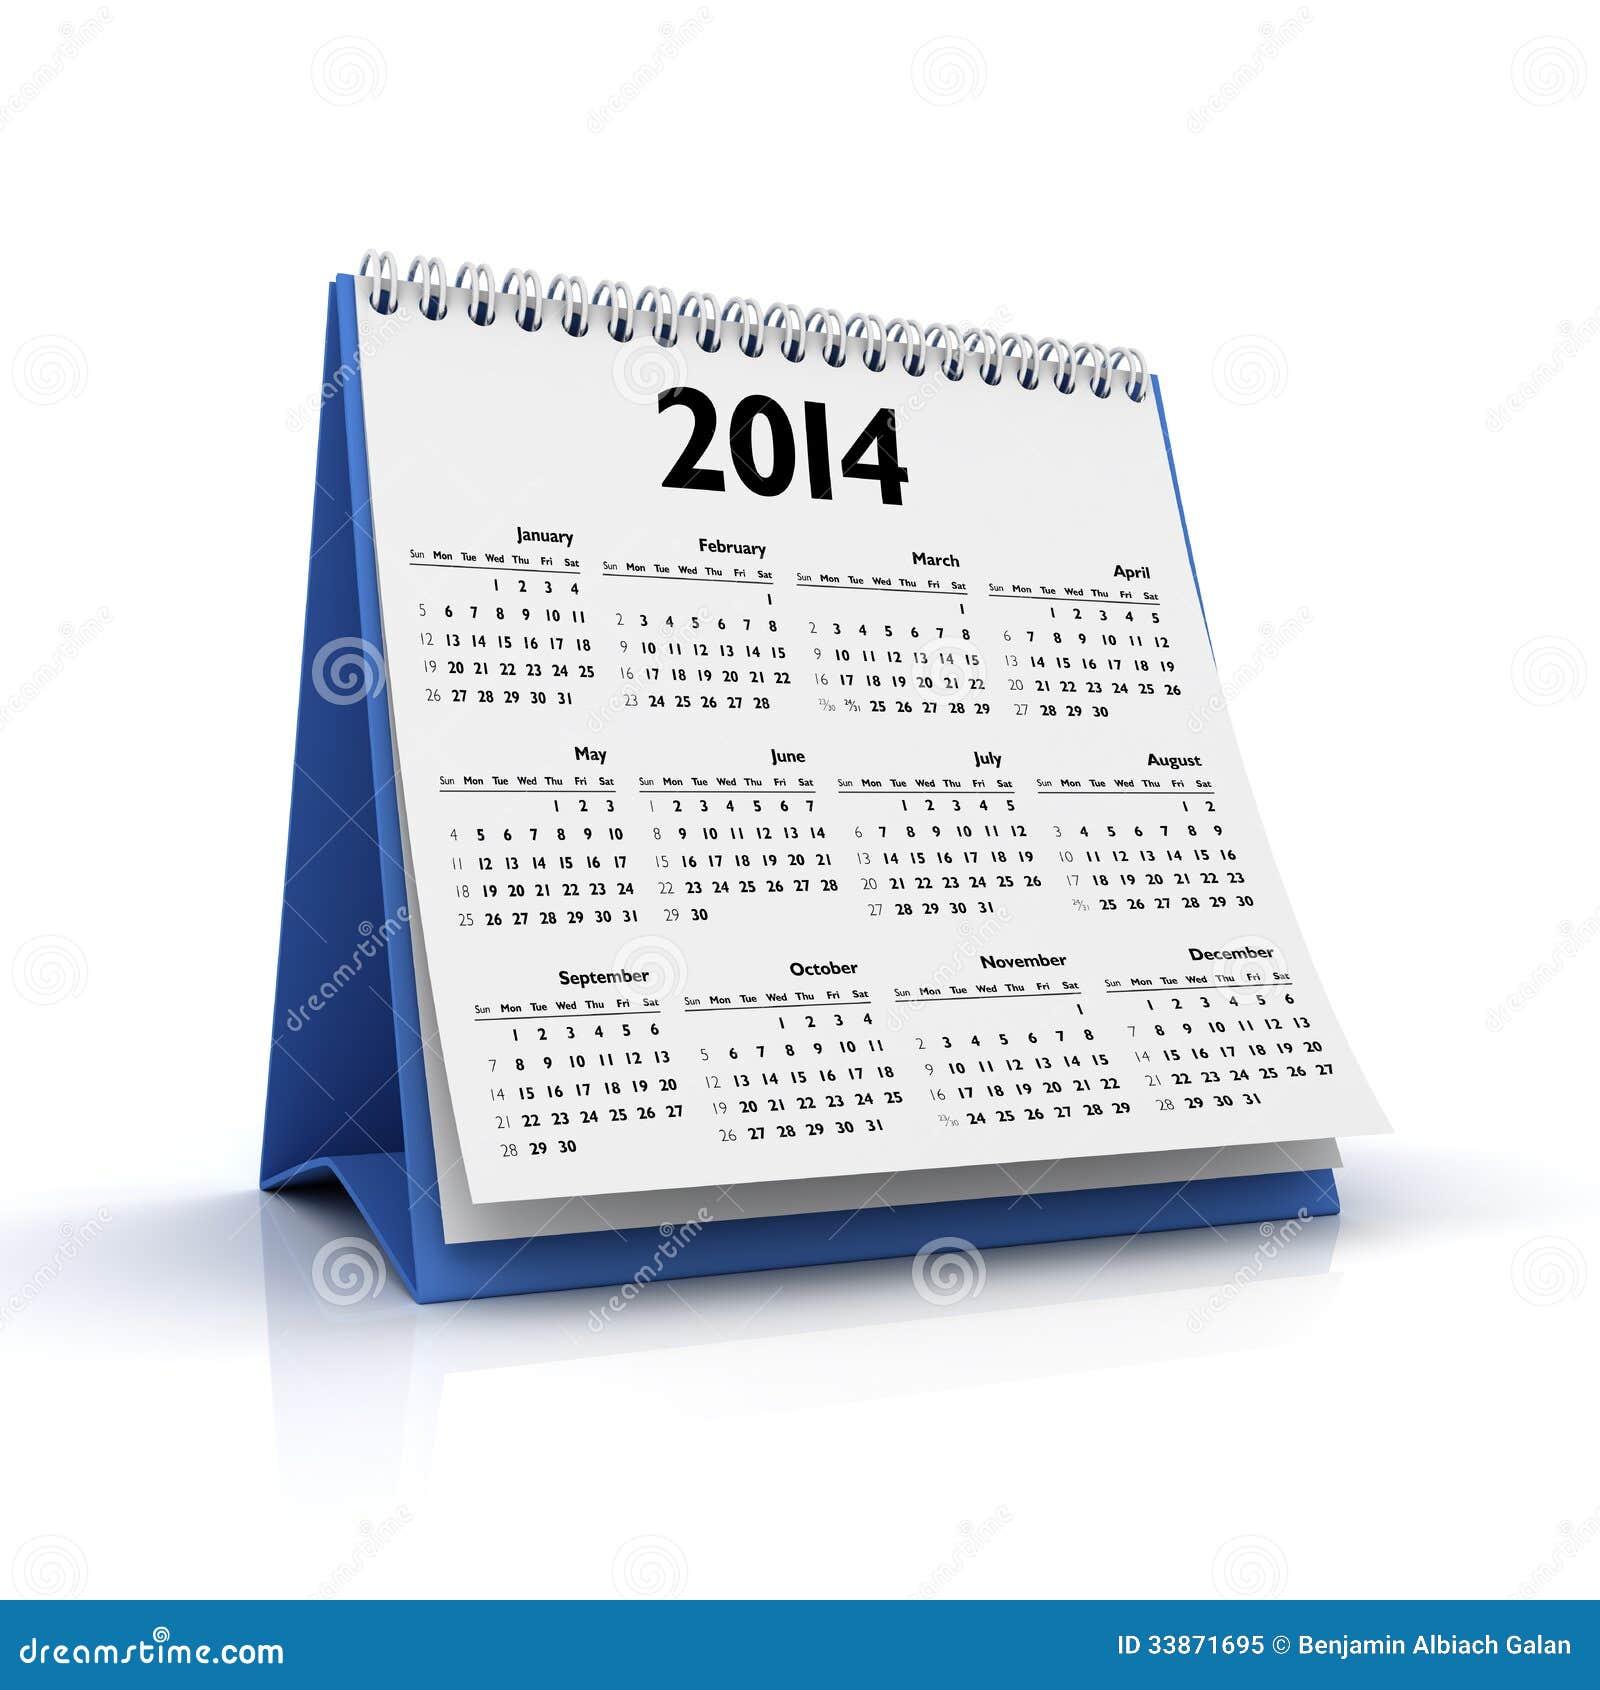 Desktop Wallpaper January 2014: Calendar 2014 Stock Illustration. Image Of 2014, November